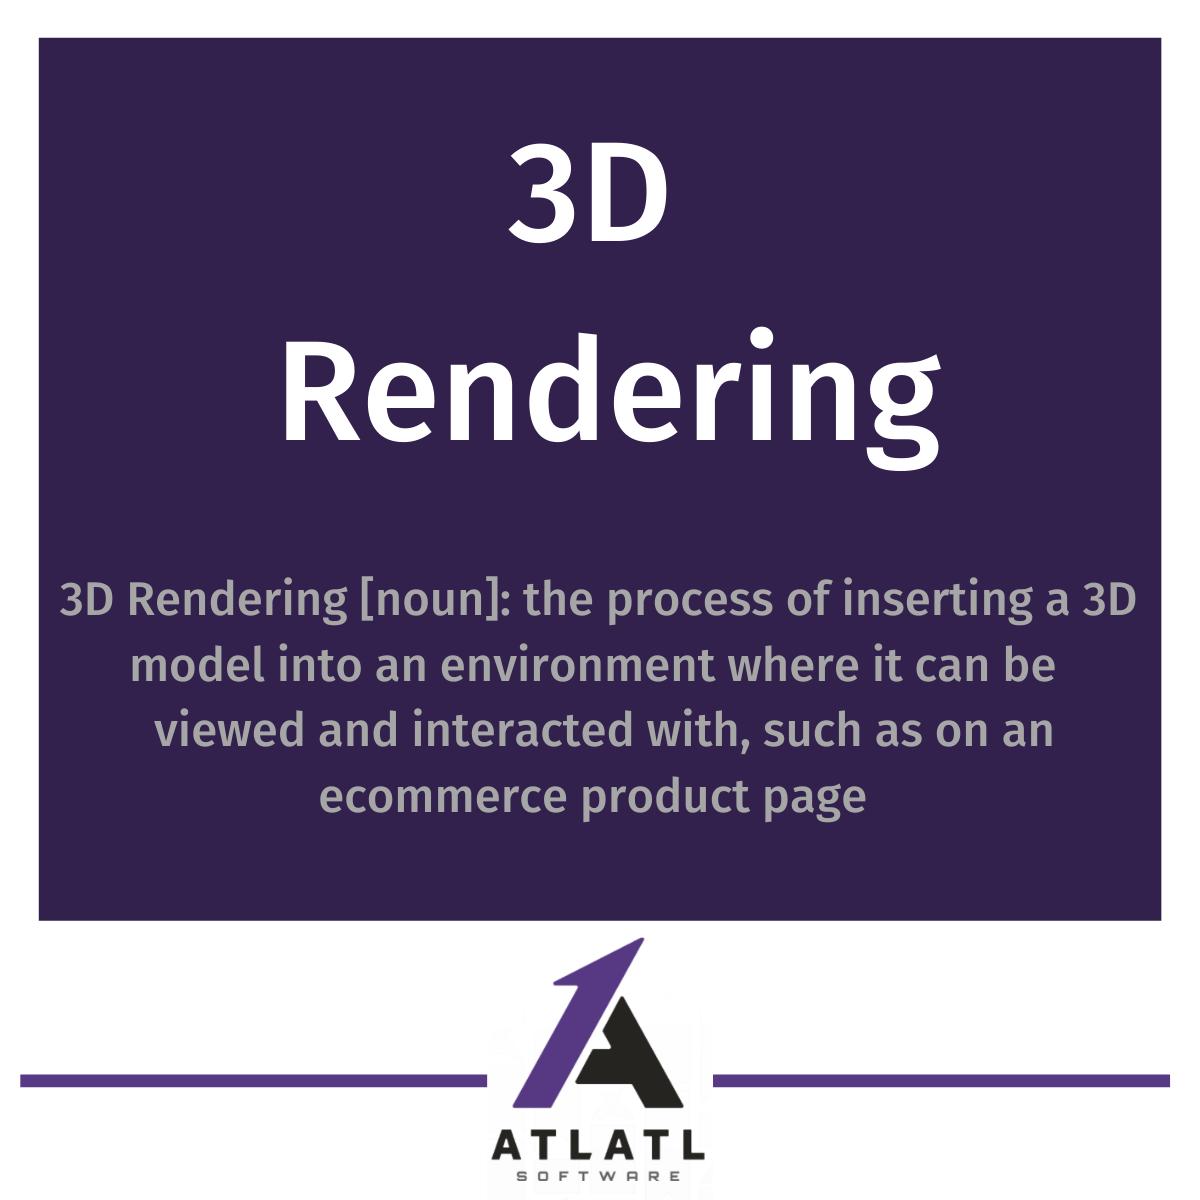 What is 3D rendering?